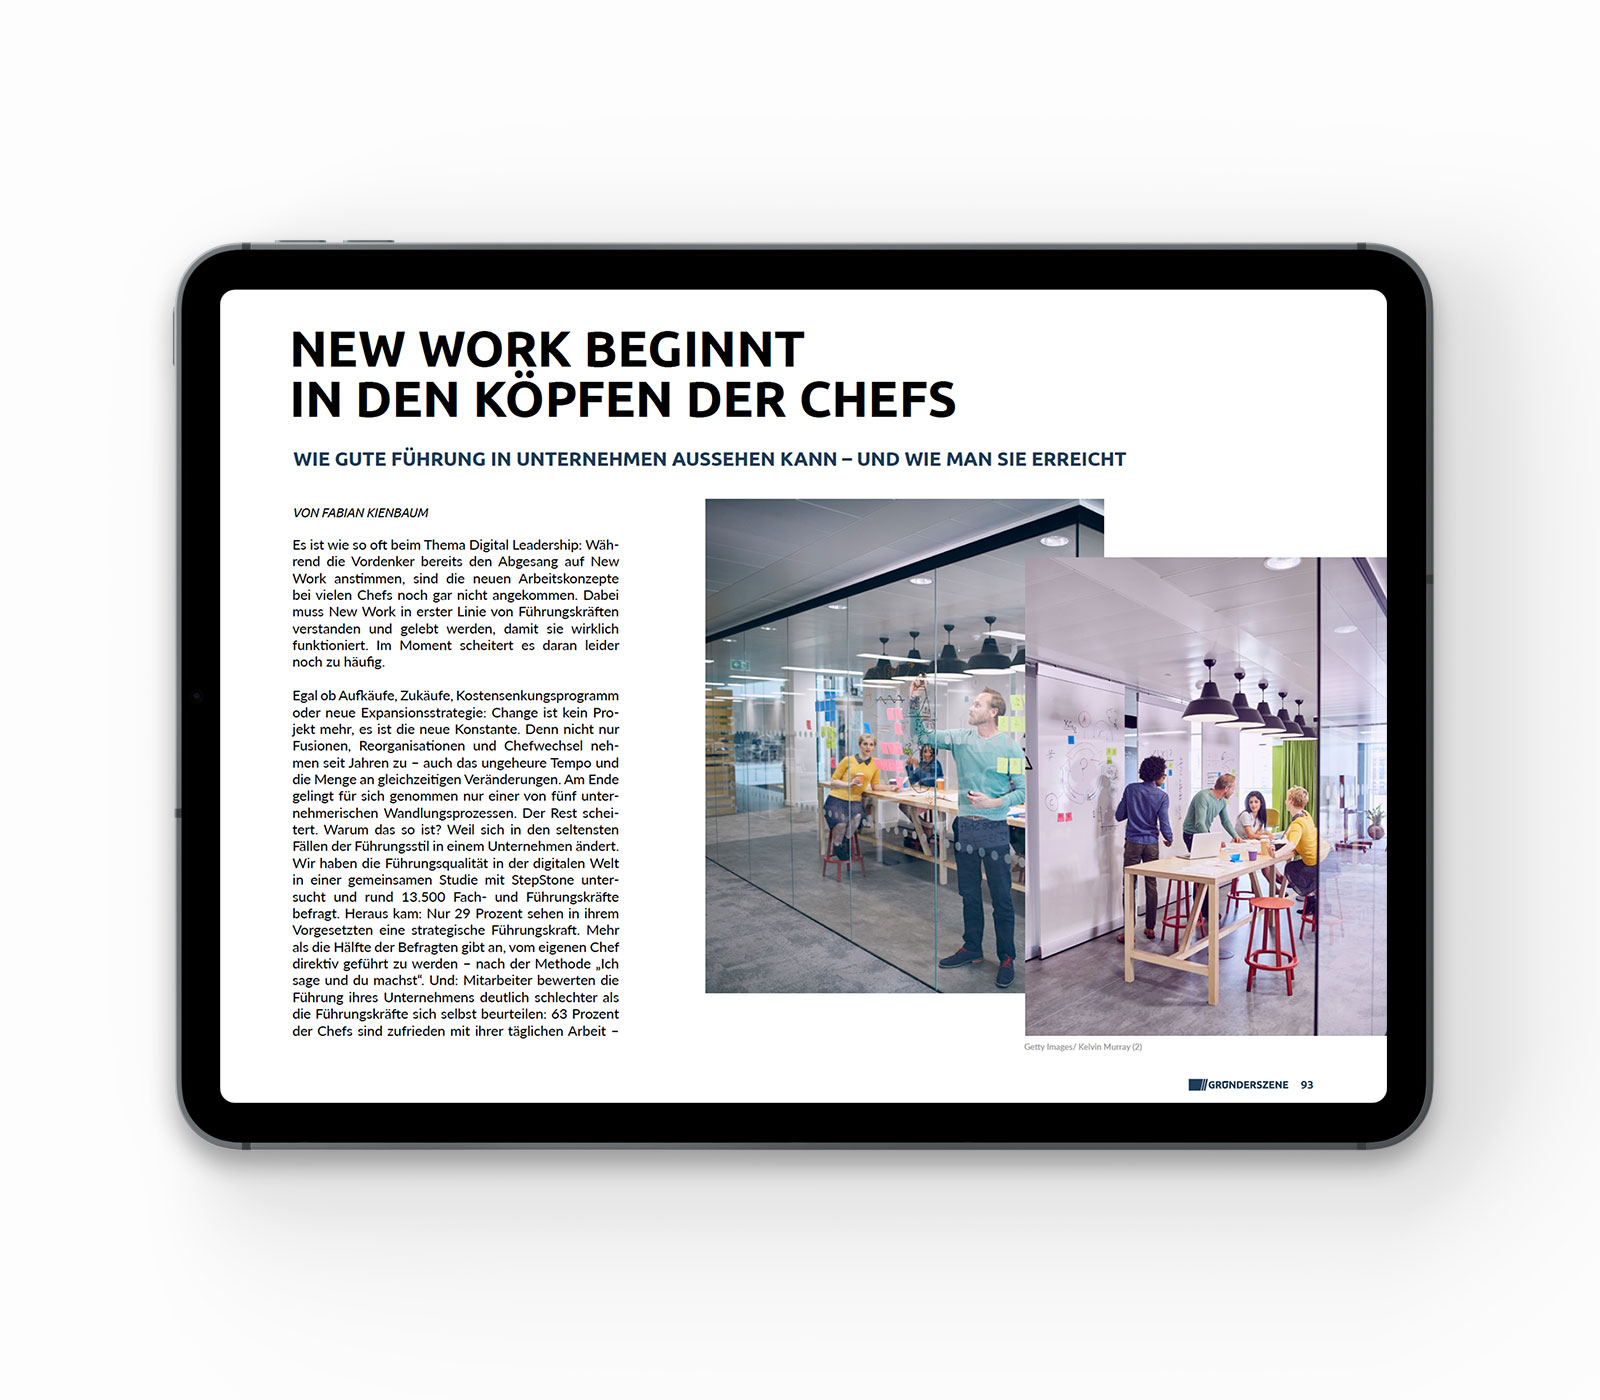 201903_GS-KI-Guide_Hubspot_Mockup_1600x1400_02_Zukunft_Arbeit